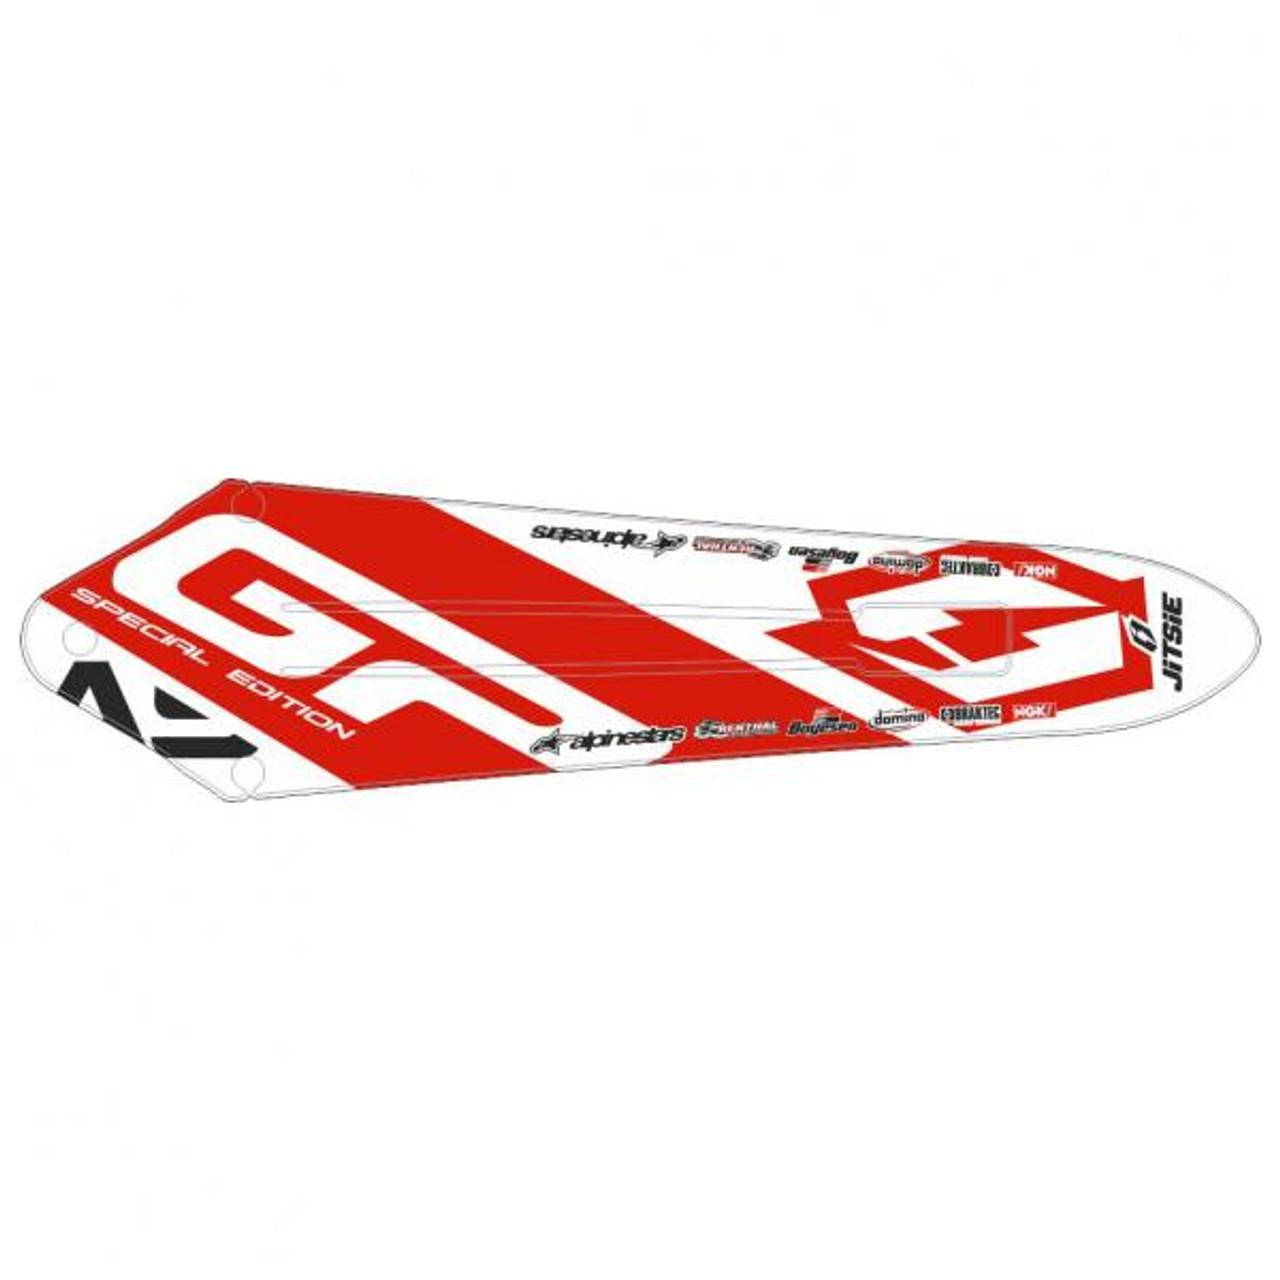 Rear Mud guard Sticker-Gas Gas Pro/Racing/Raga/Factory 11-18, white/red